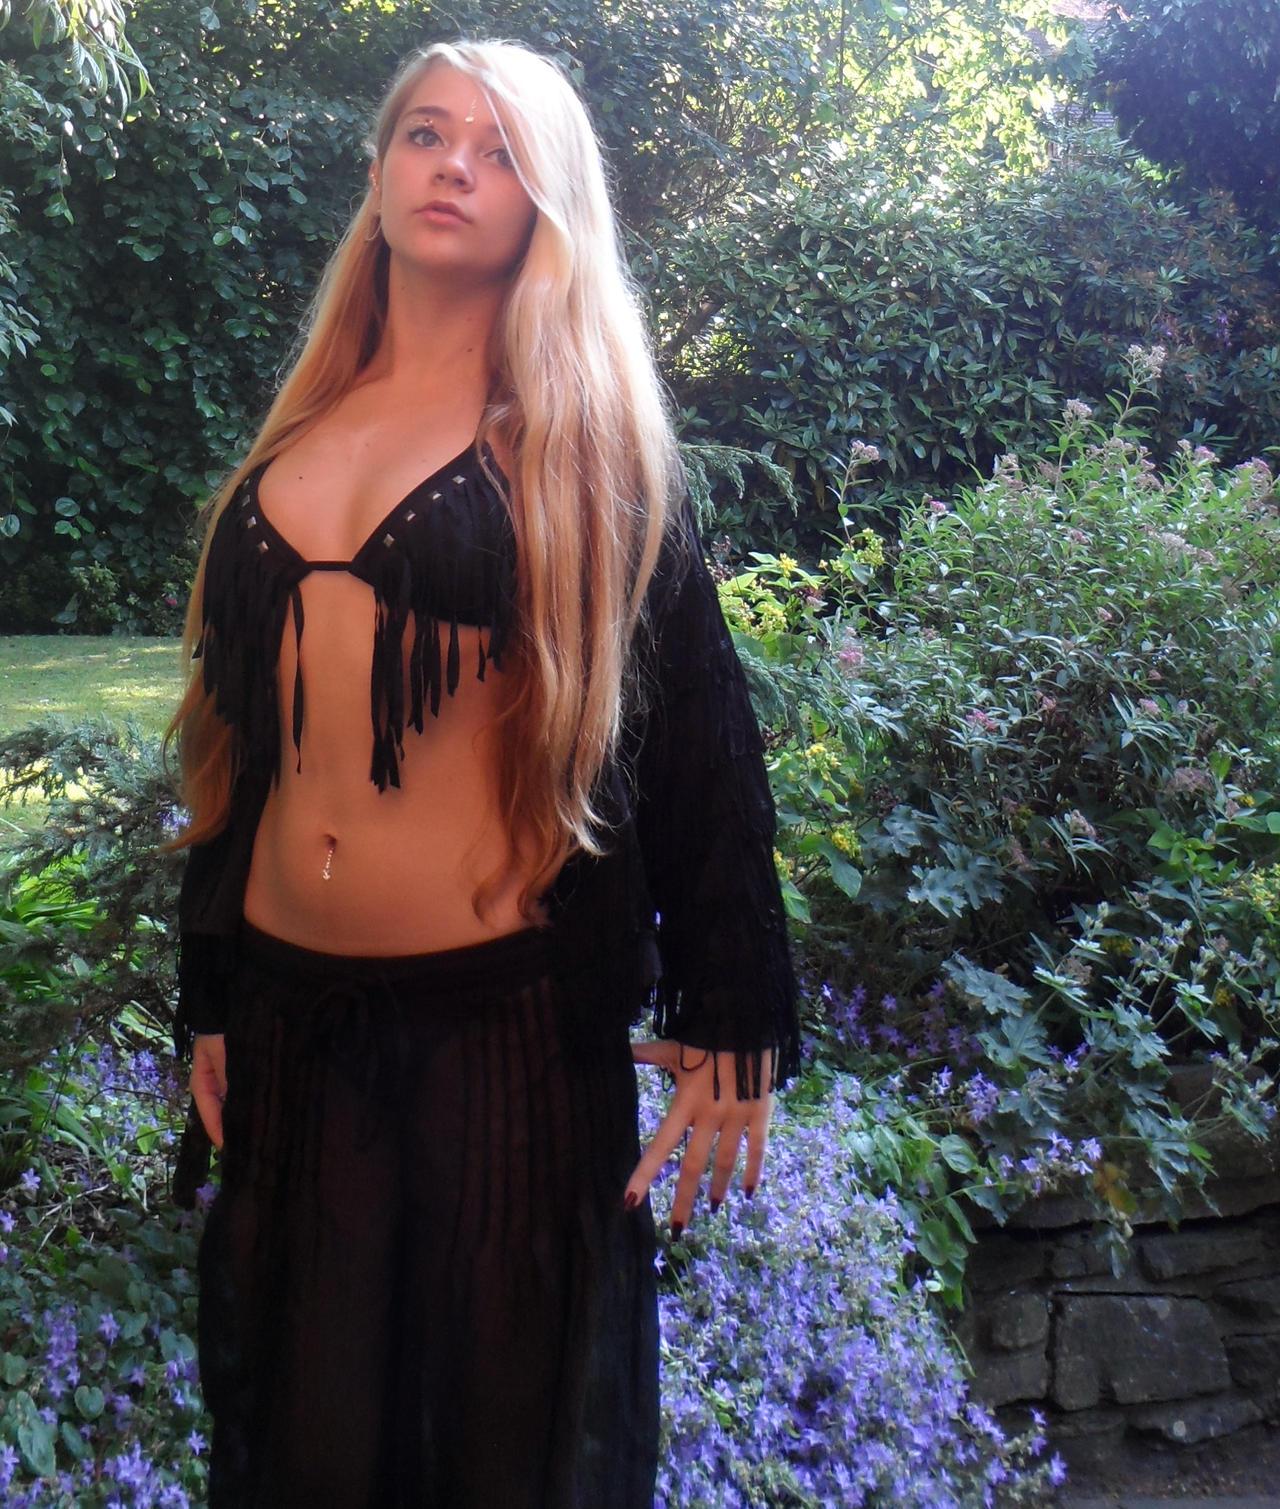 STOCK_46.9_Belly Dancer - Bikini by Bellastanyer-STOCK